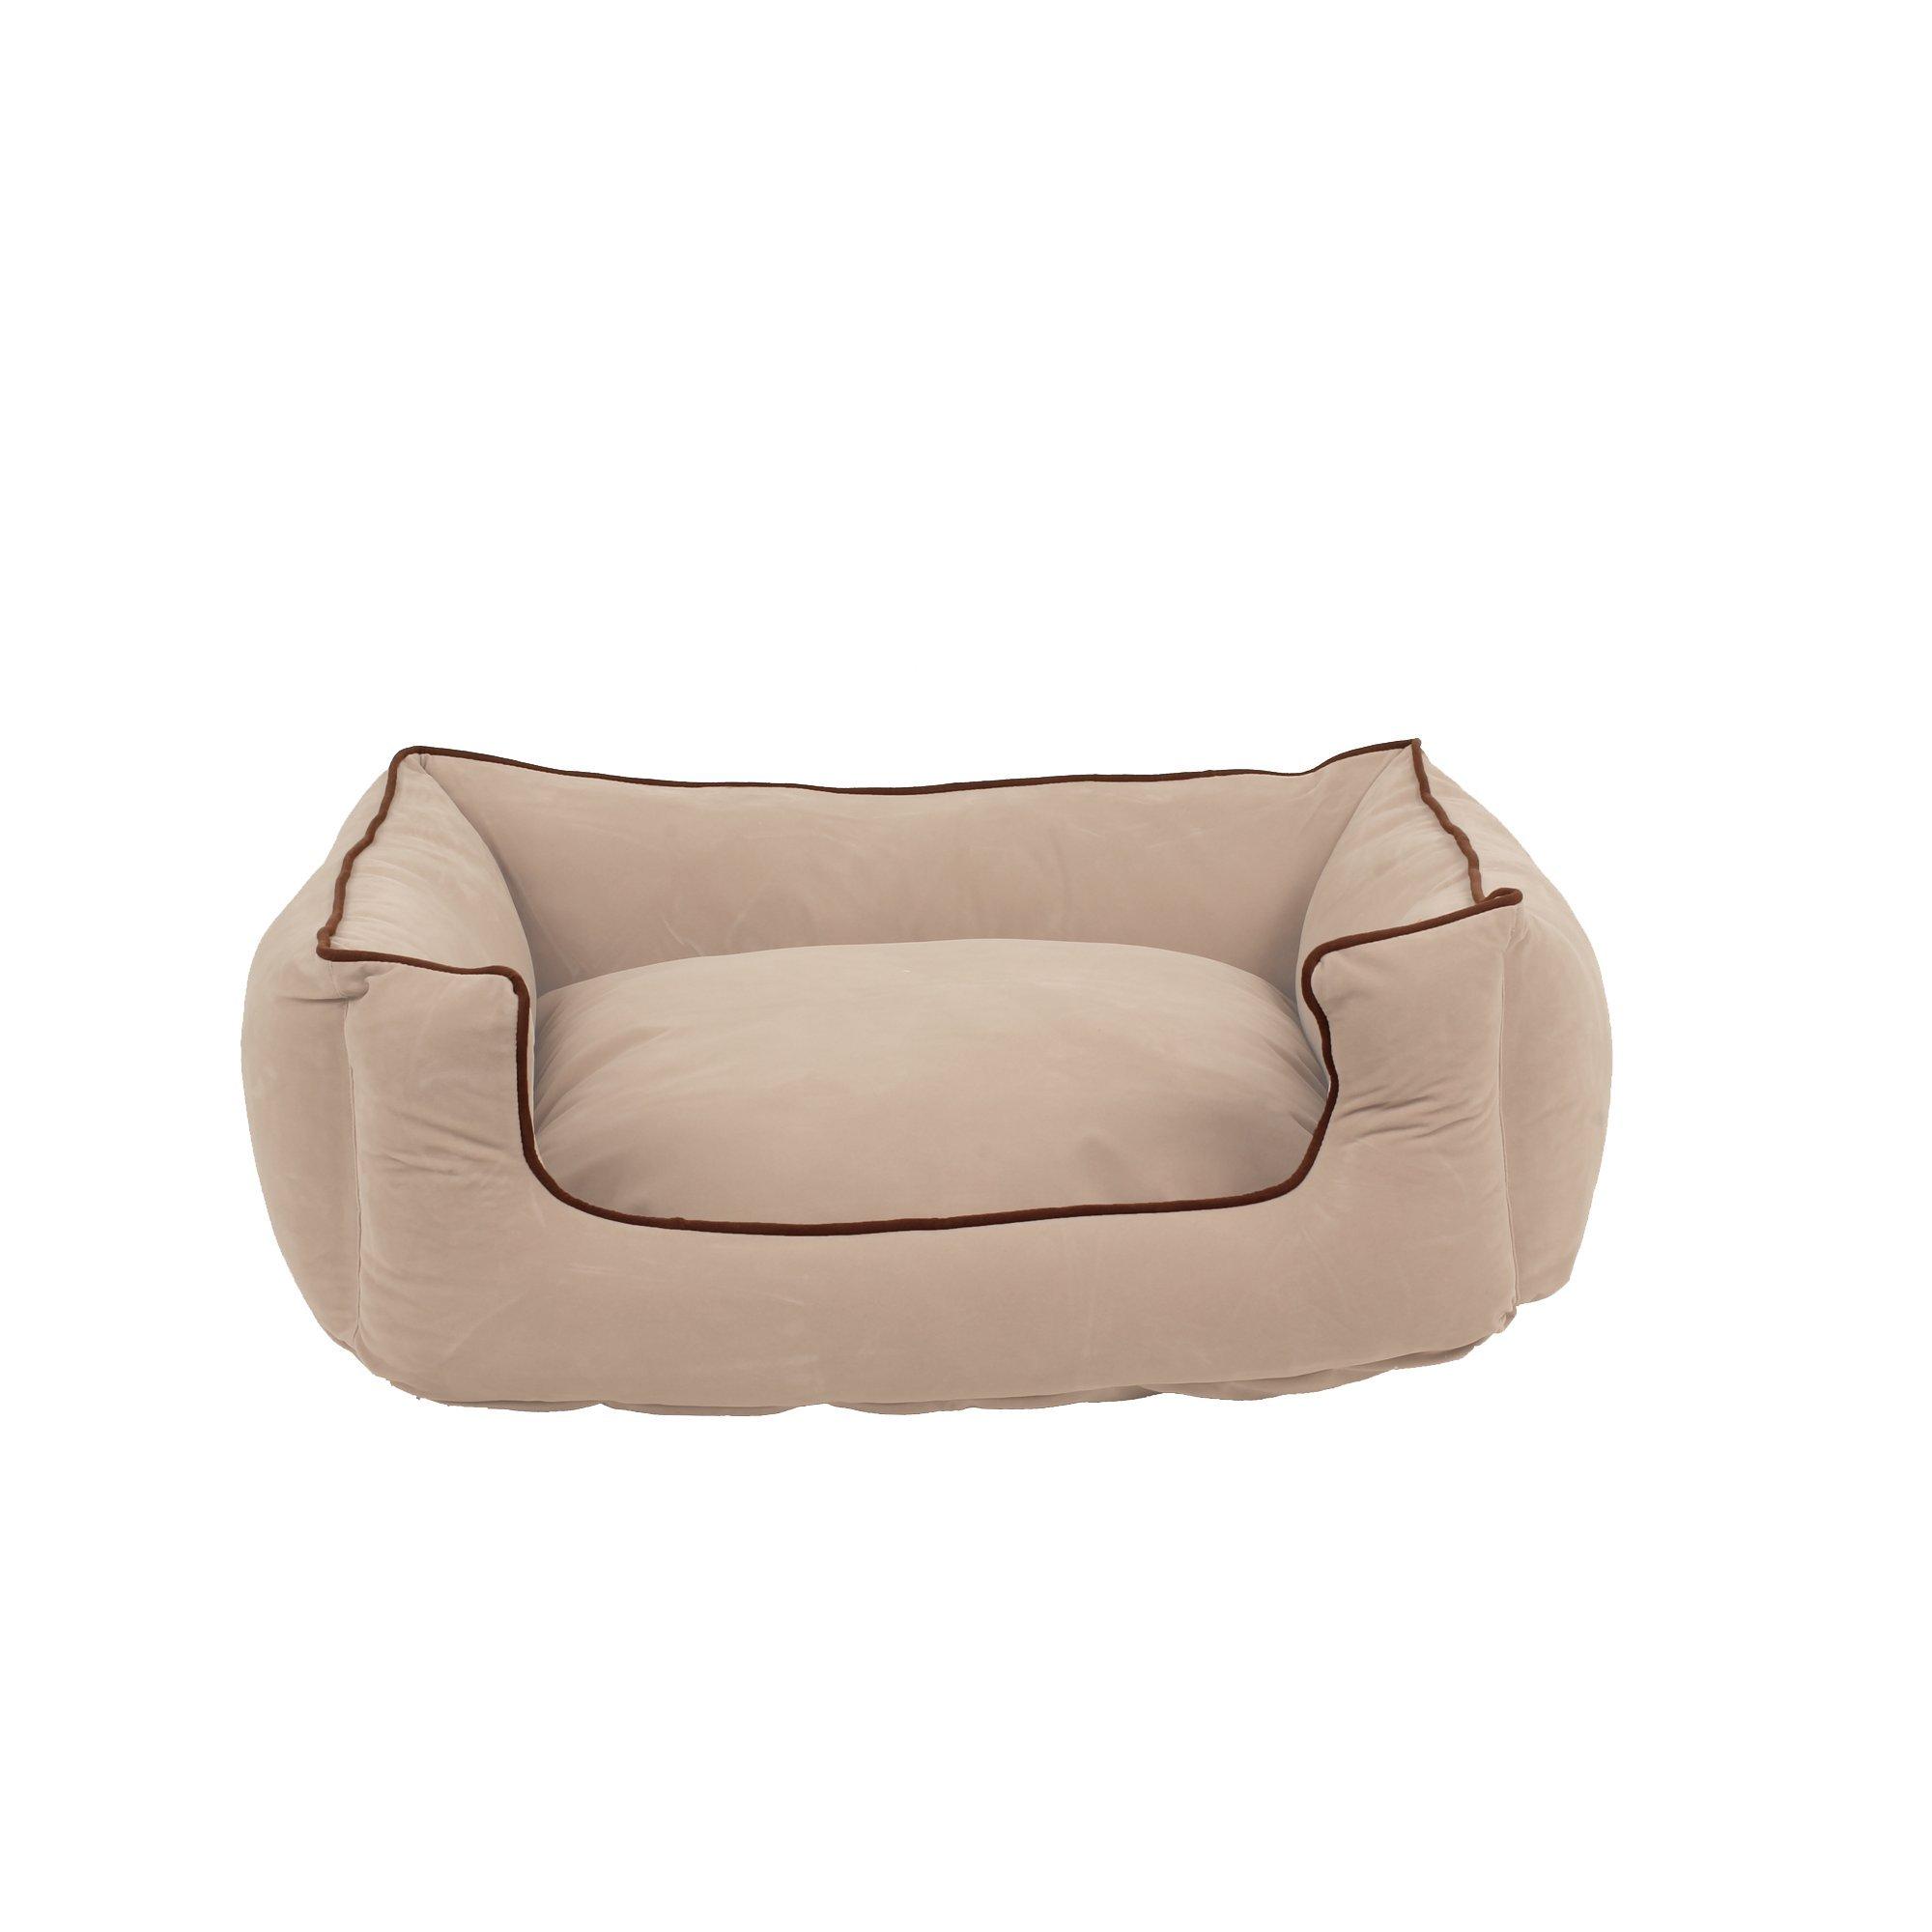 Carolina Pet Microfiber Kuddle Lounge Low Profile Bed for Pets, Medium, Khaki/Chocolate